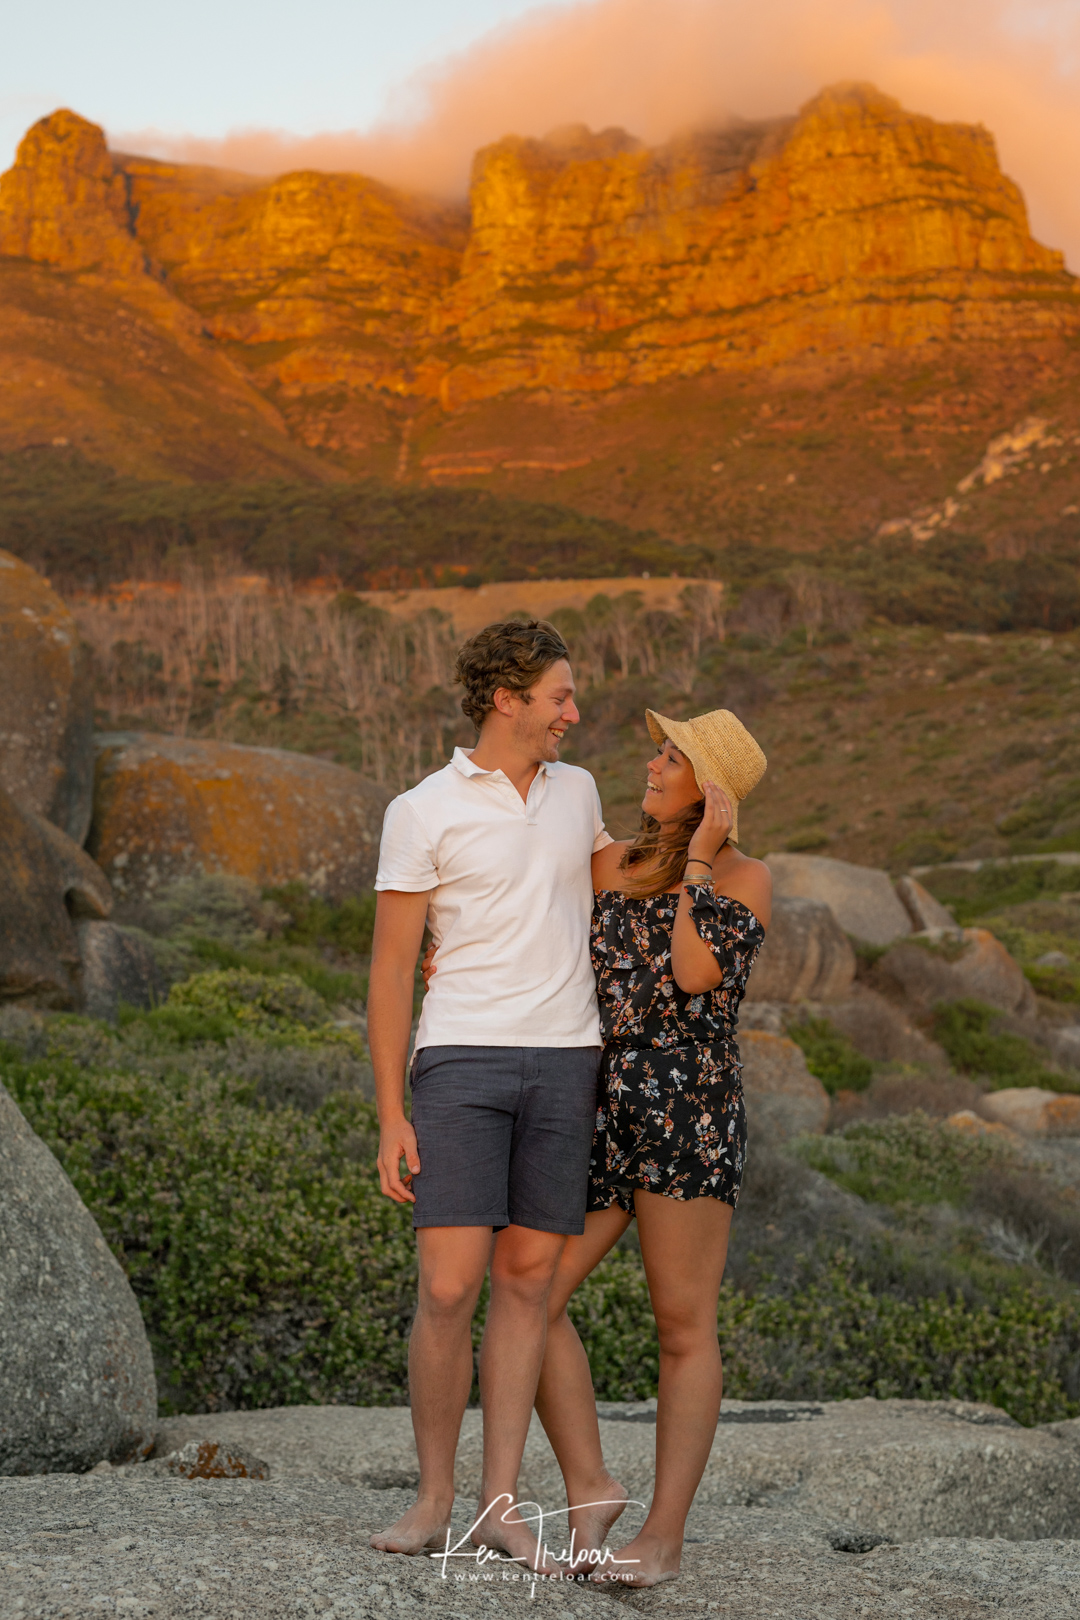 Ken Treloar Photography - _Llandudno_Sunset Couples Session 2019-22.jpg